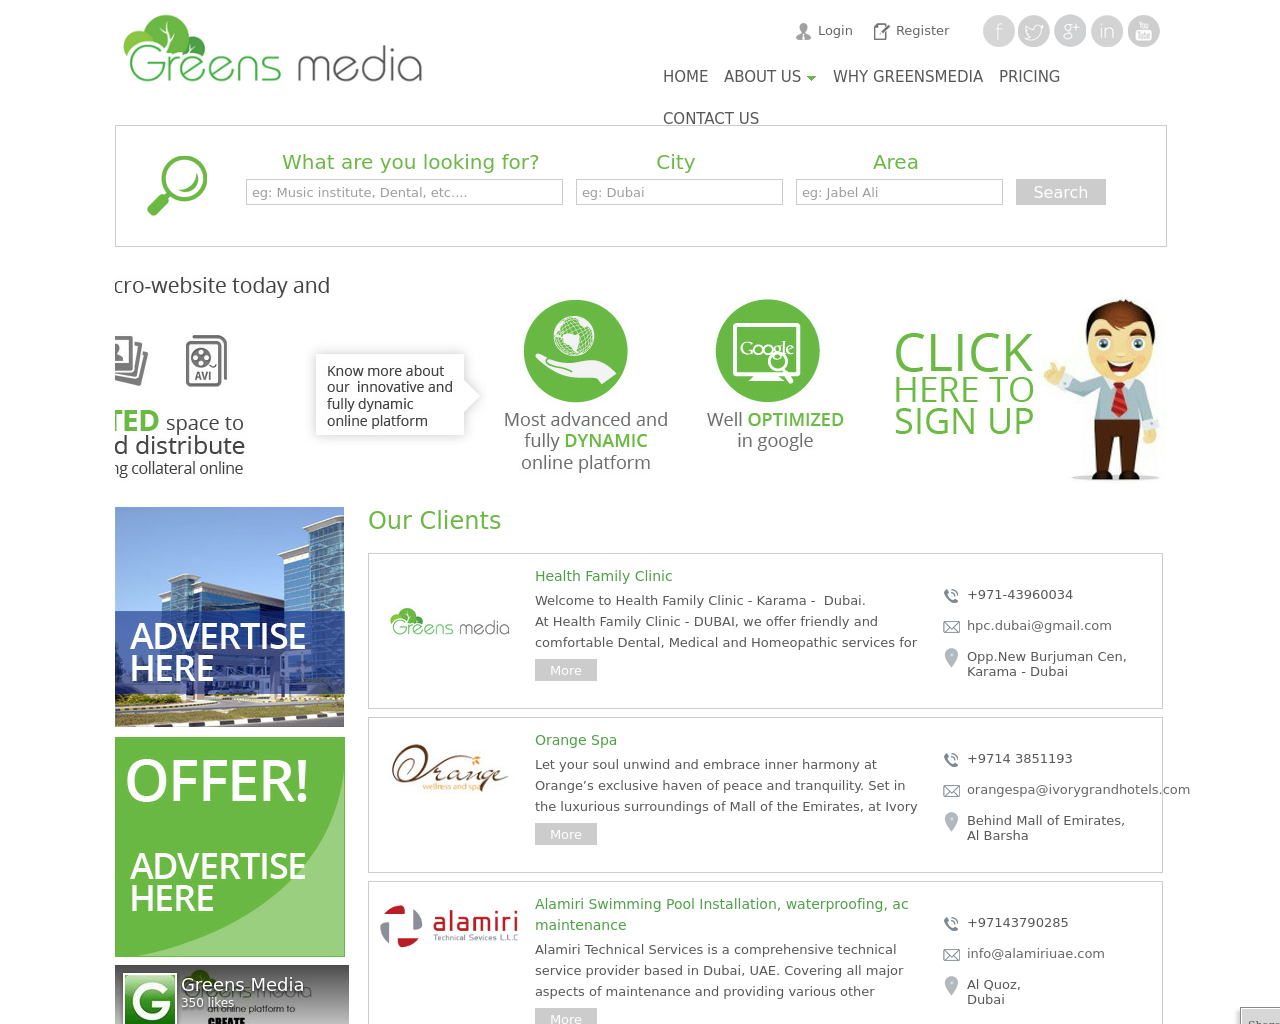 Greens-Media-Advertising-Reviews-Pricing